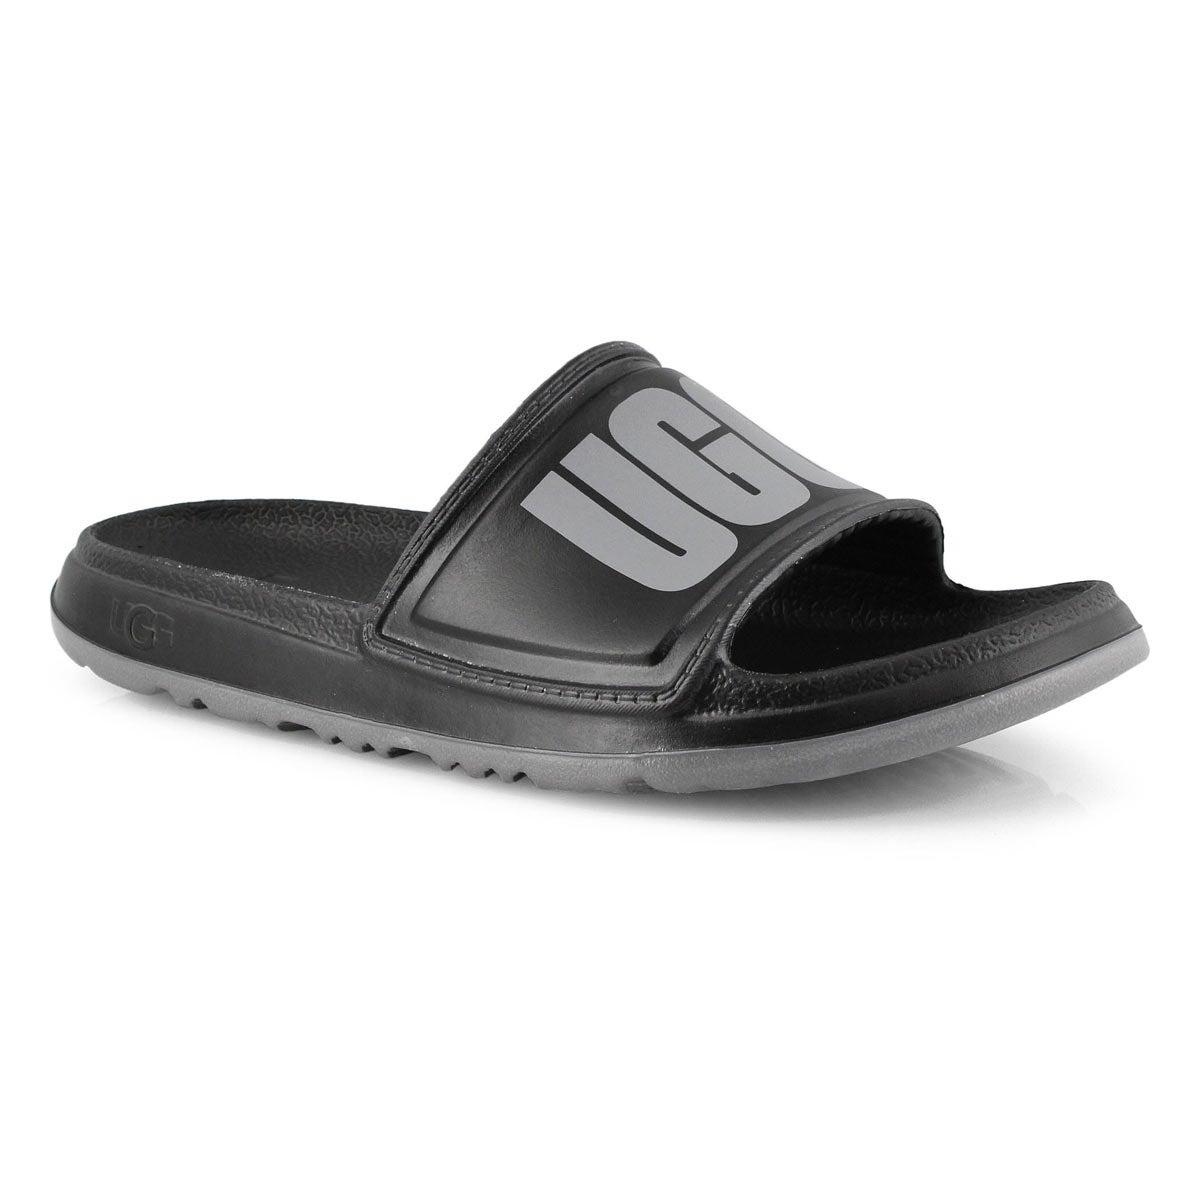 Lds Wilcox black slide sandal